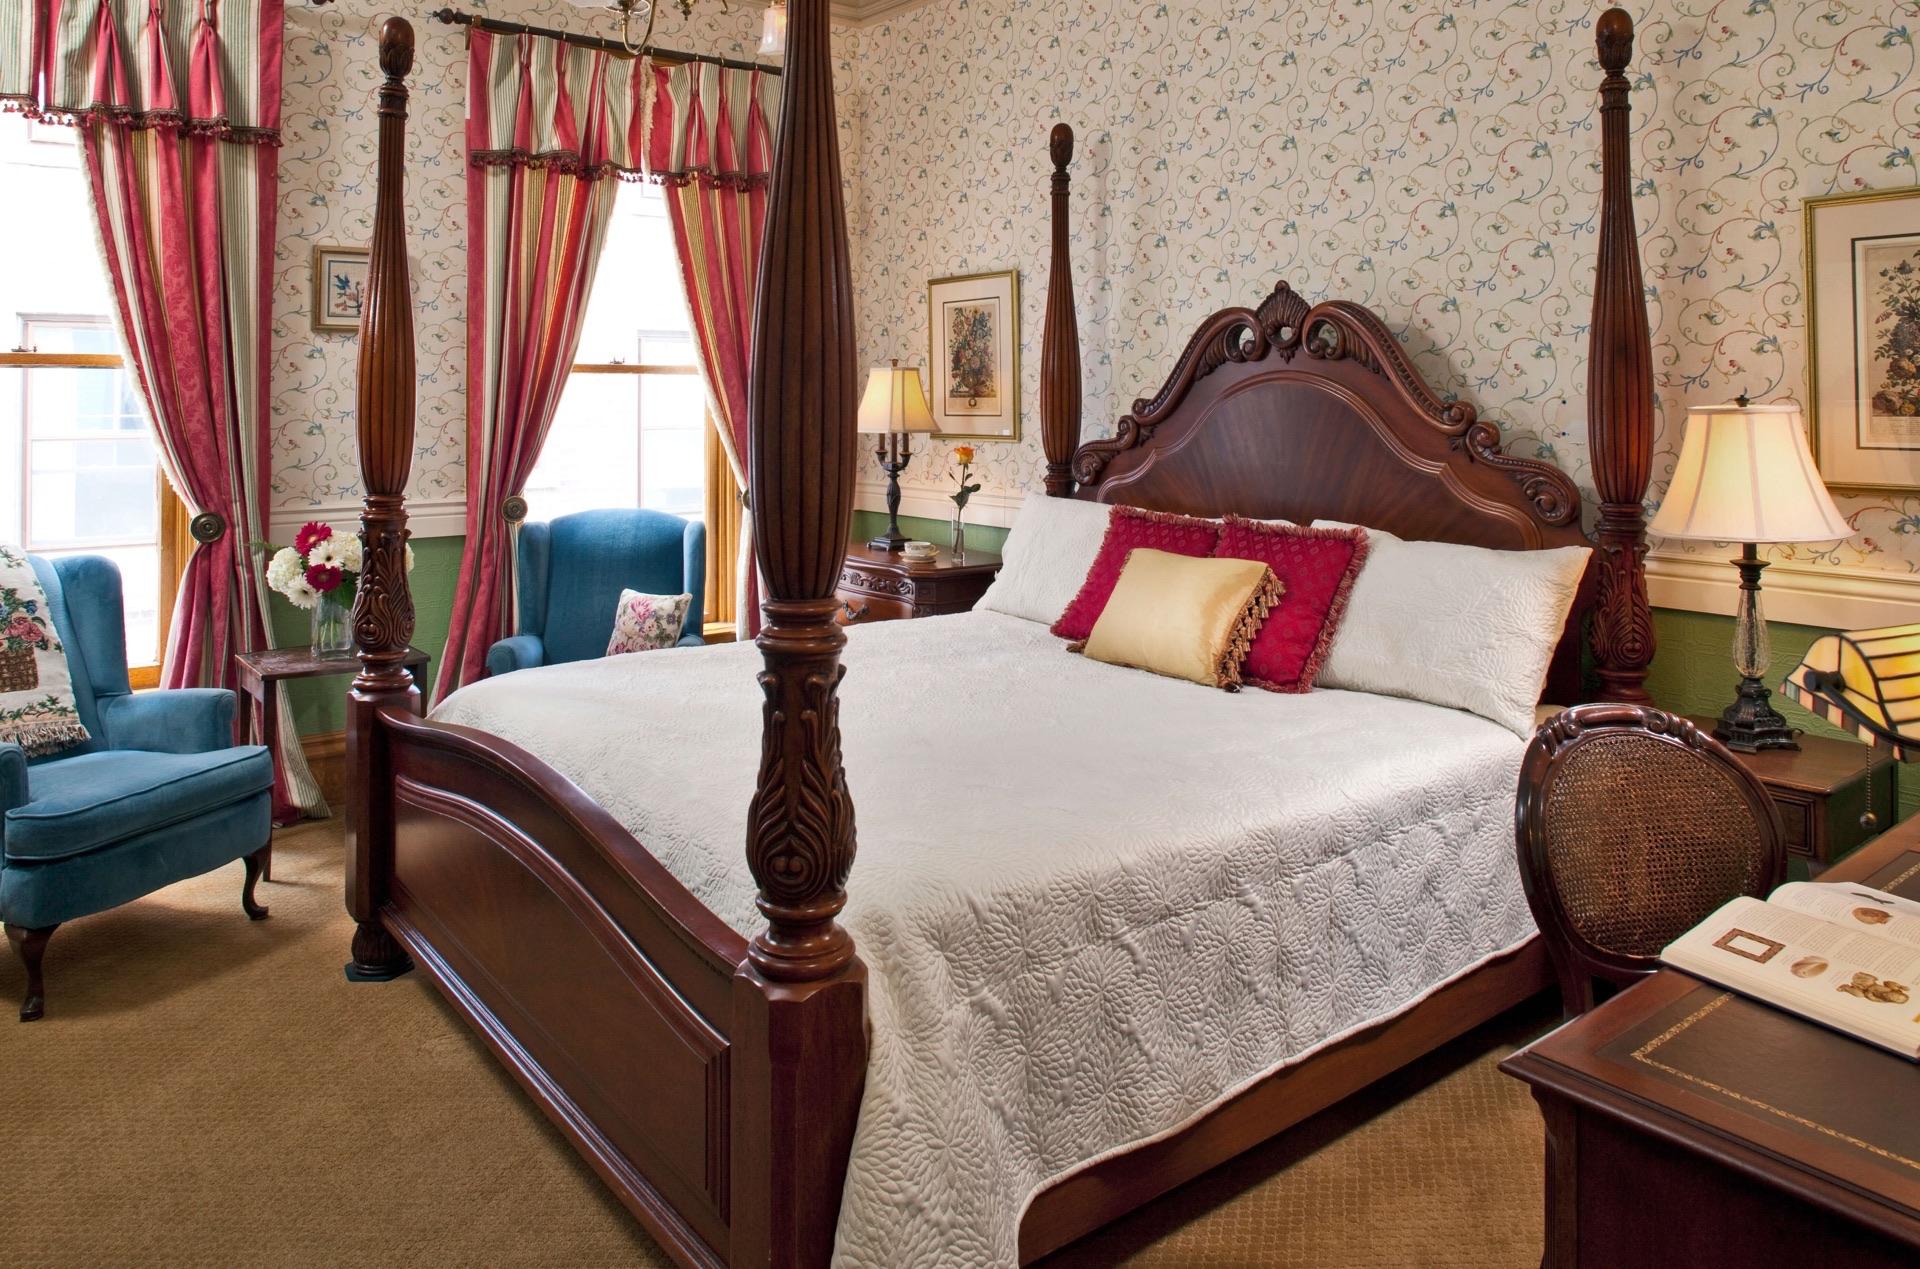 romantic hotels in kalamazoo mi the kalamazoo house bed. Black Bedroom Furniture Sets. Home Design Ideas